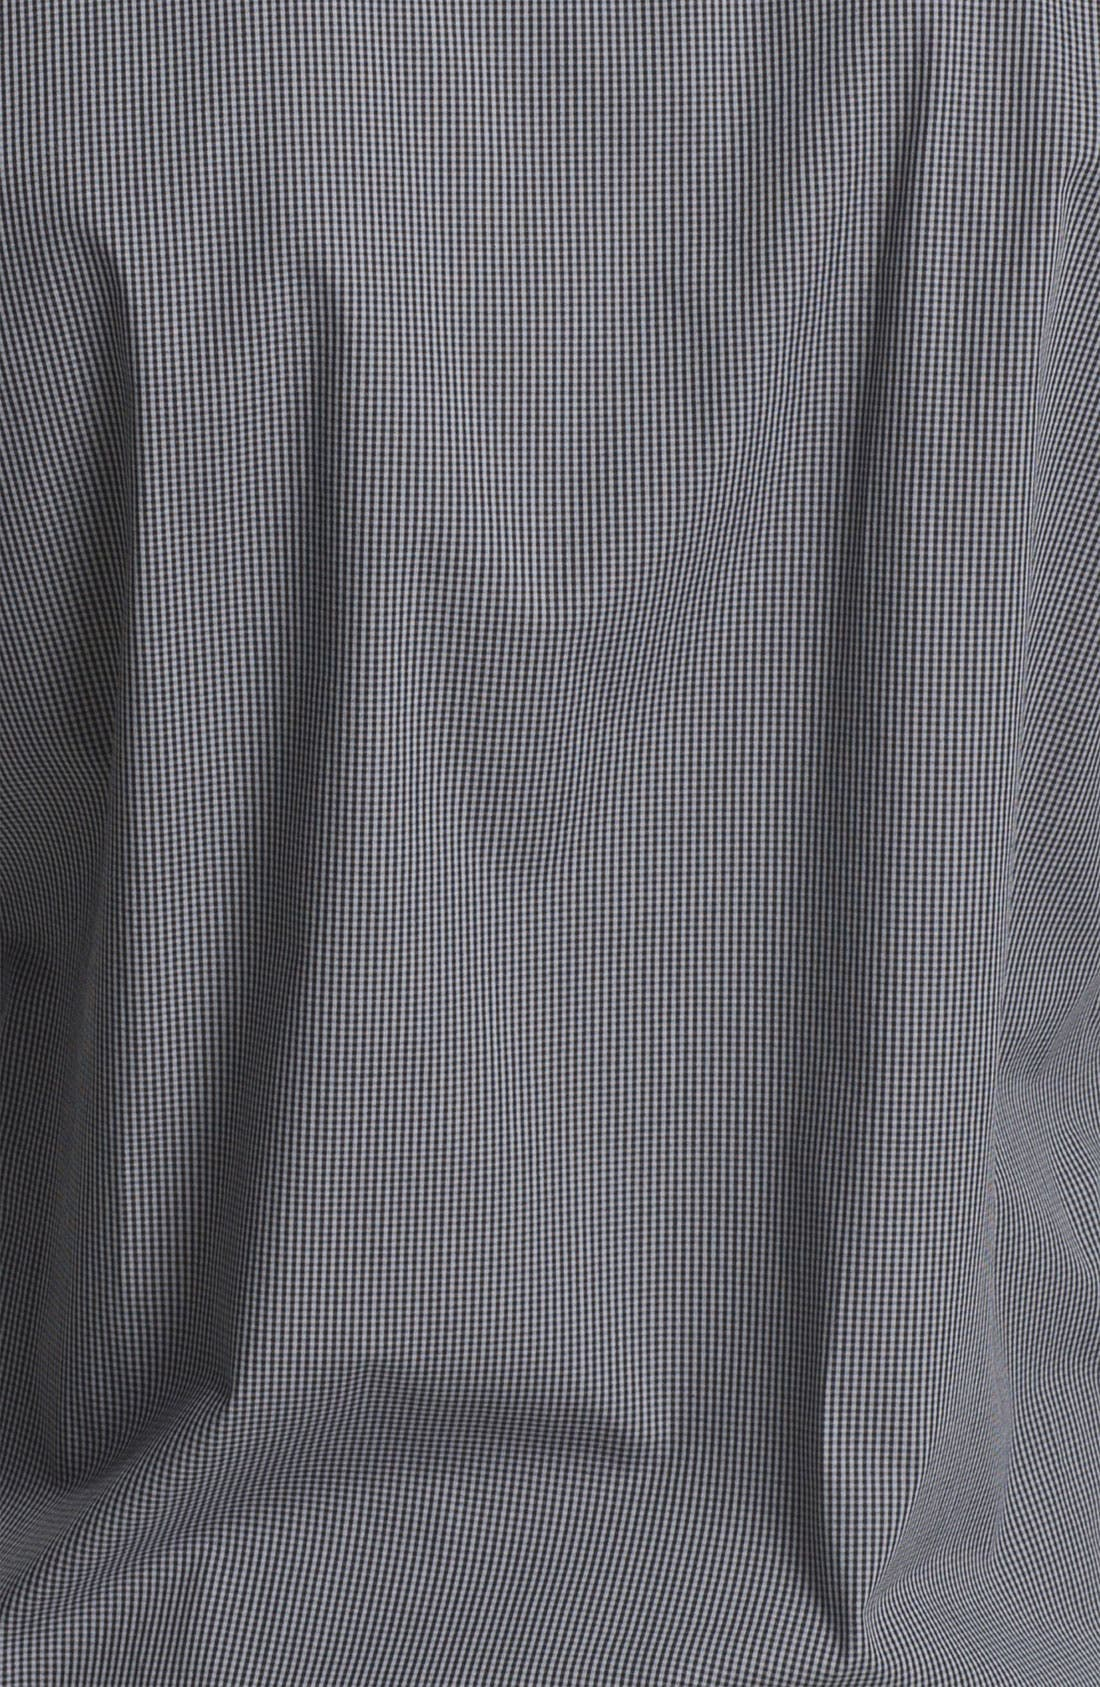 Alternate Image 3  - Theory 'Zack PS. Lorone' Trim Fit Sport Shirt